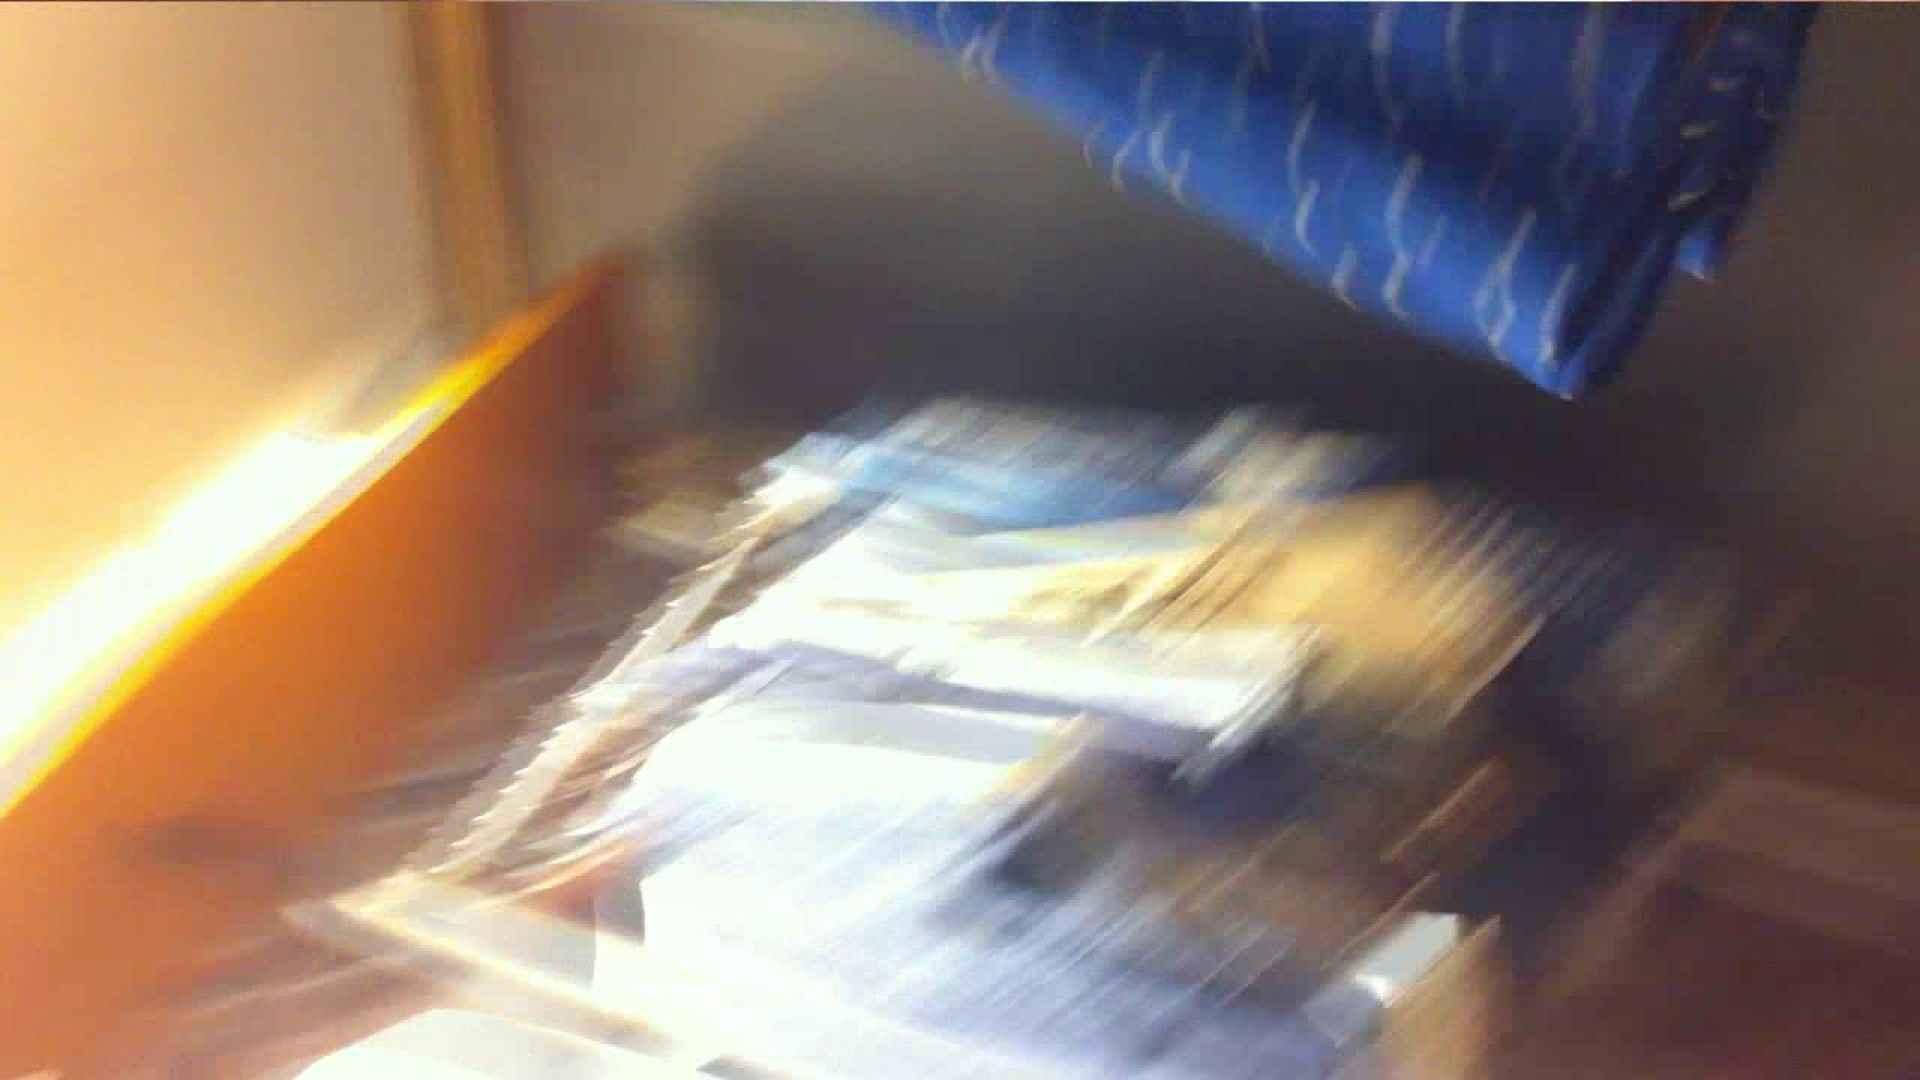 vol.34 美人アパレル胸チラ&パンチラ メガネ属性っていいよね♥ 新入生パンチラ ヌード画像 104pic 28